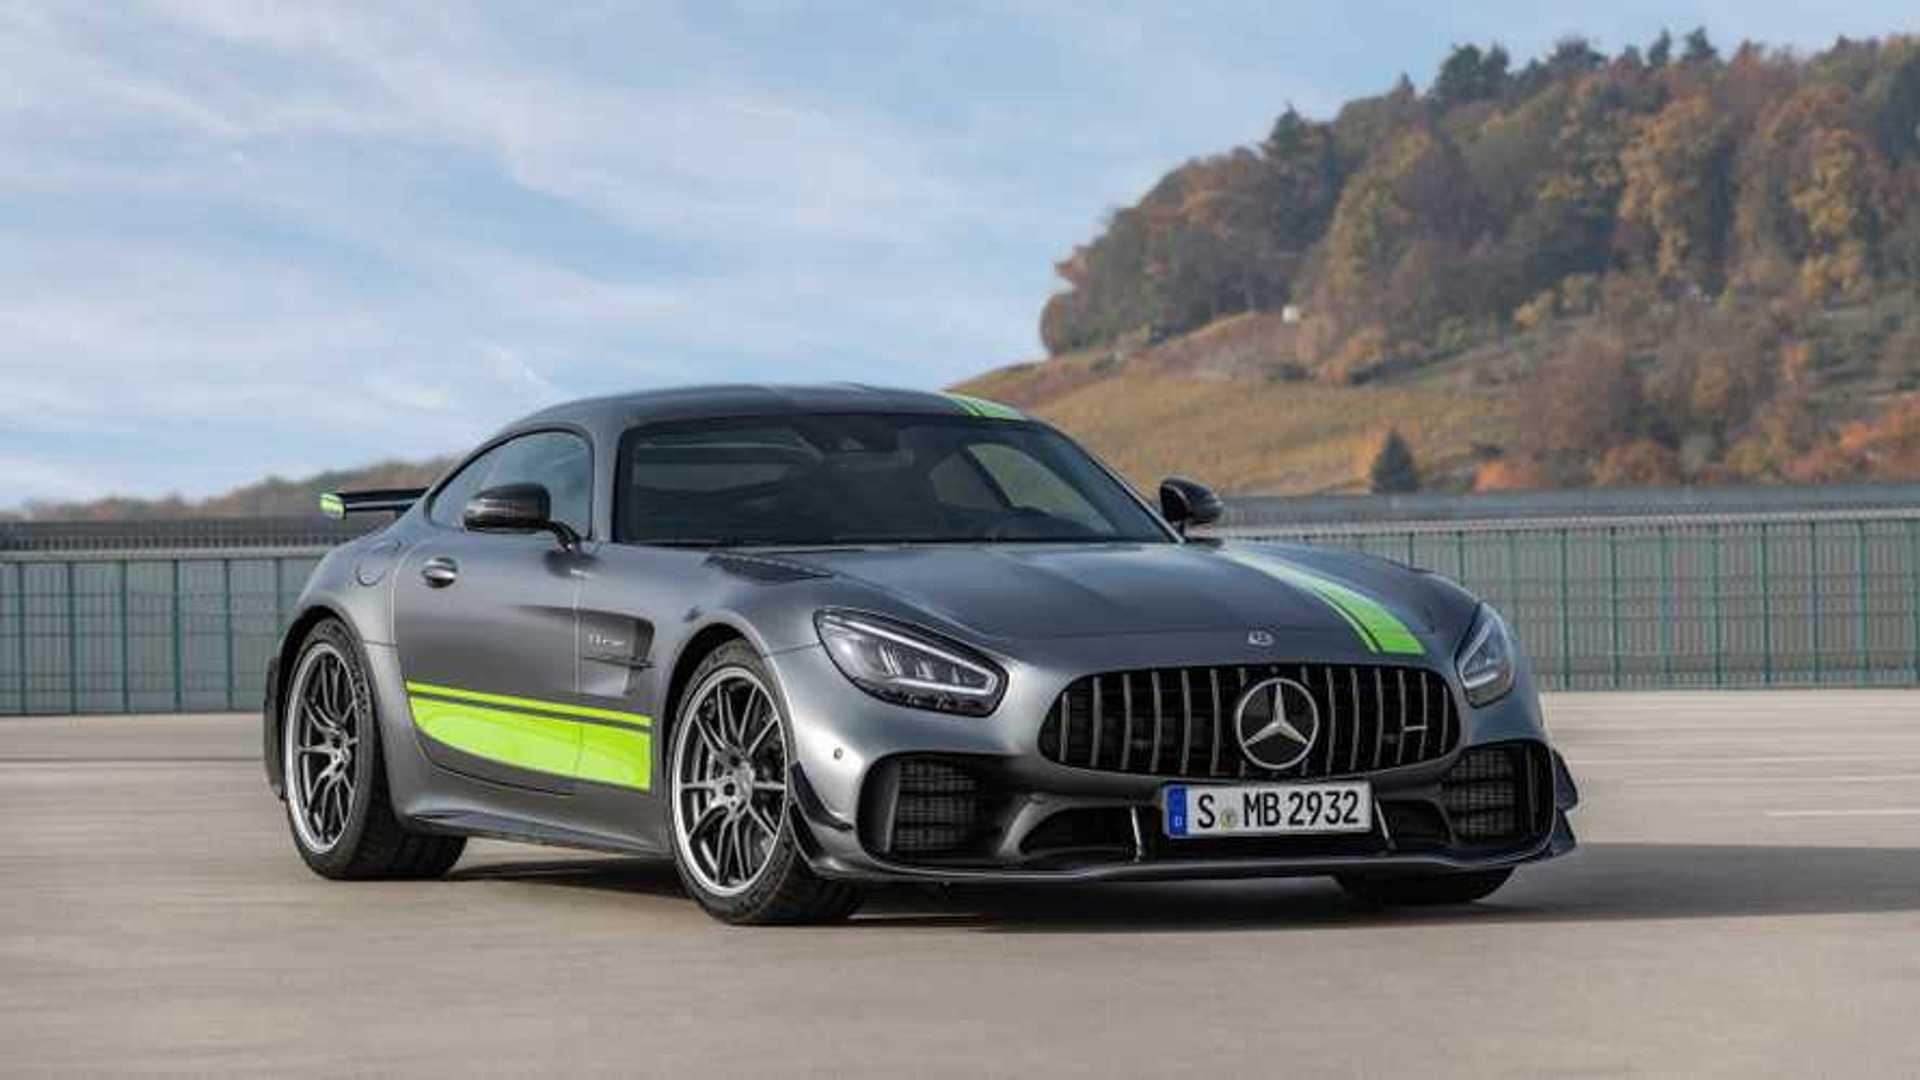 Mercedes Amg Hypercar >> AMG GT Black Series: Fastest AMG Ever, Save For One Hypercar